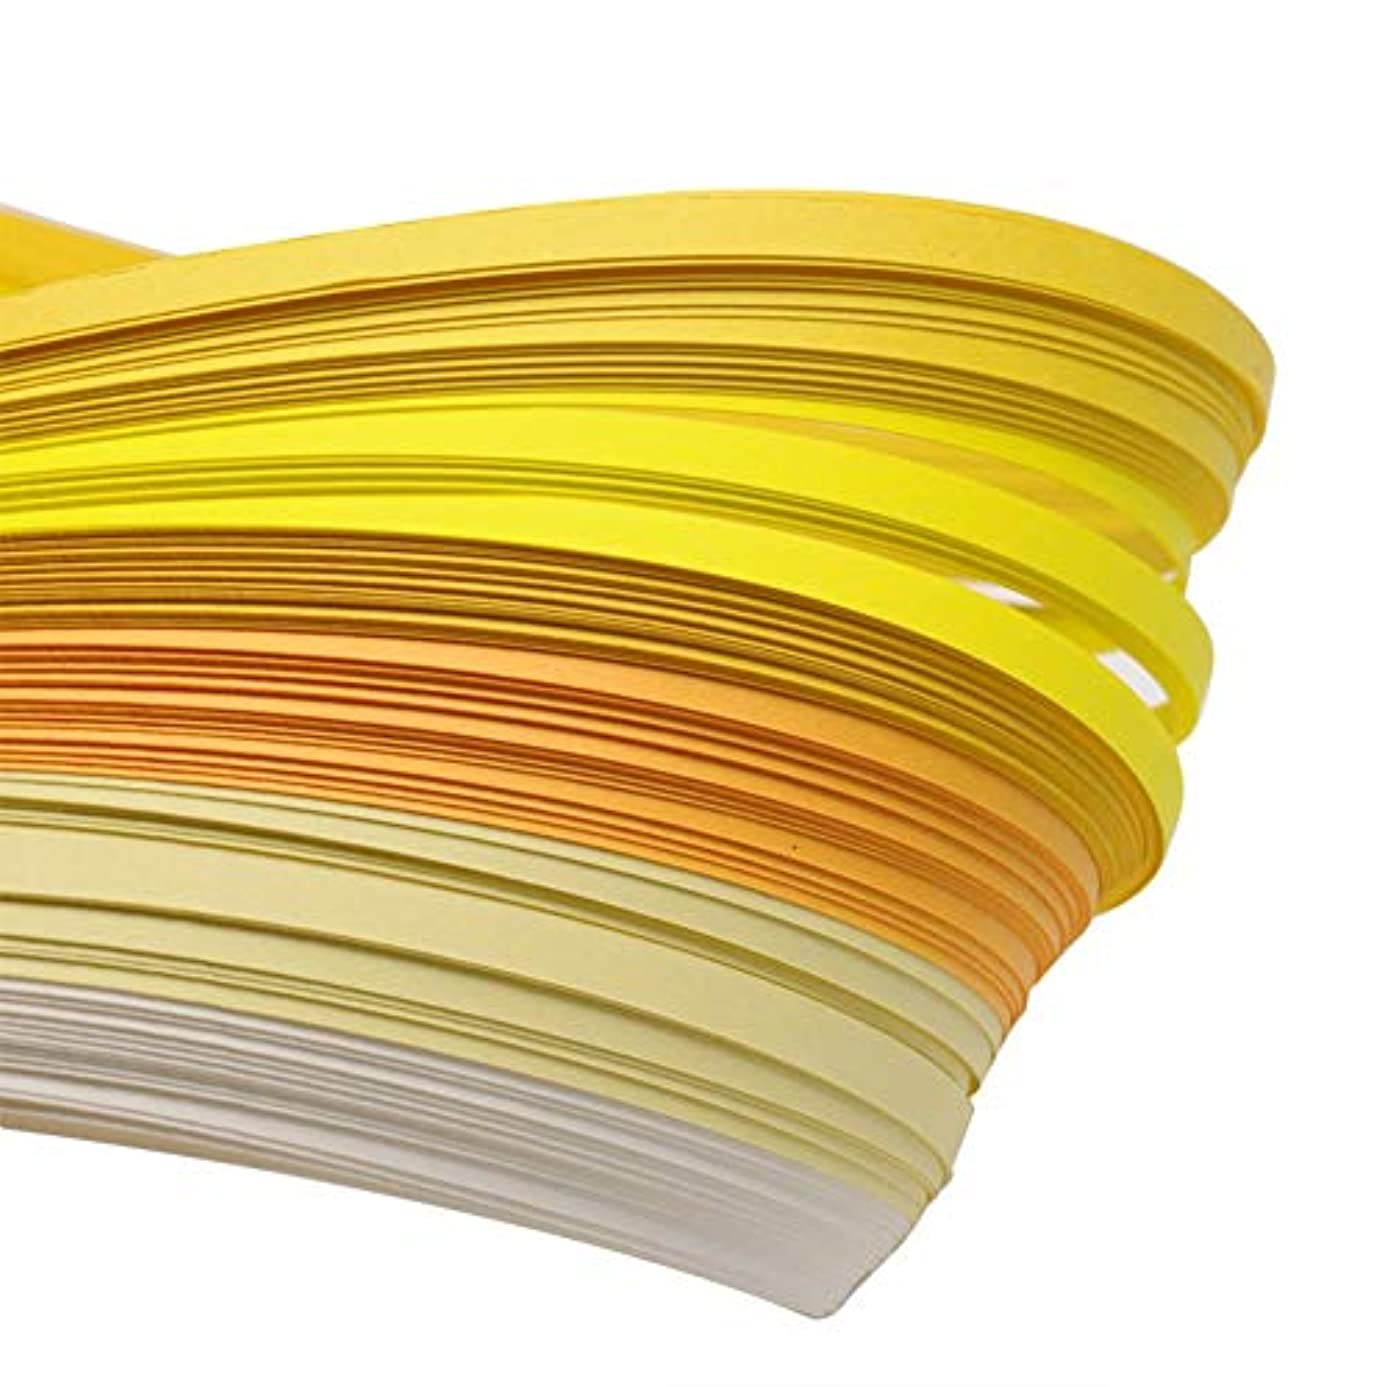 ARRICRAFT 10 Bag Quilling Paper Strips 5mm Paper Quilling Kits 6 Colors Quilling Art Strips, About 120strips/bag, 20strips/Color